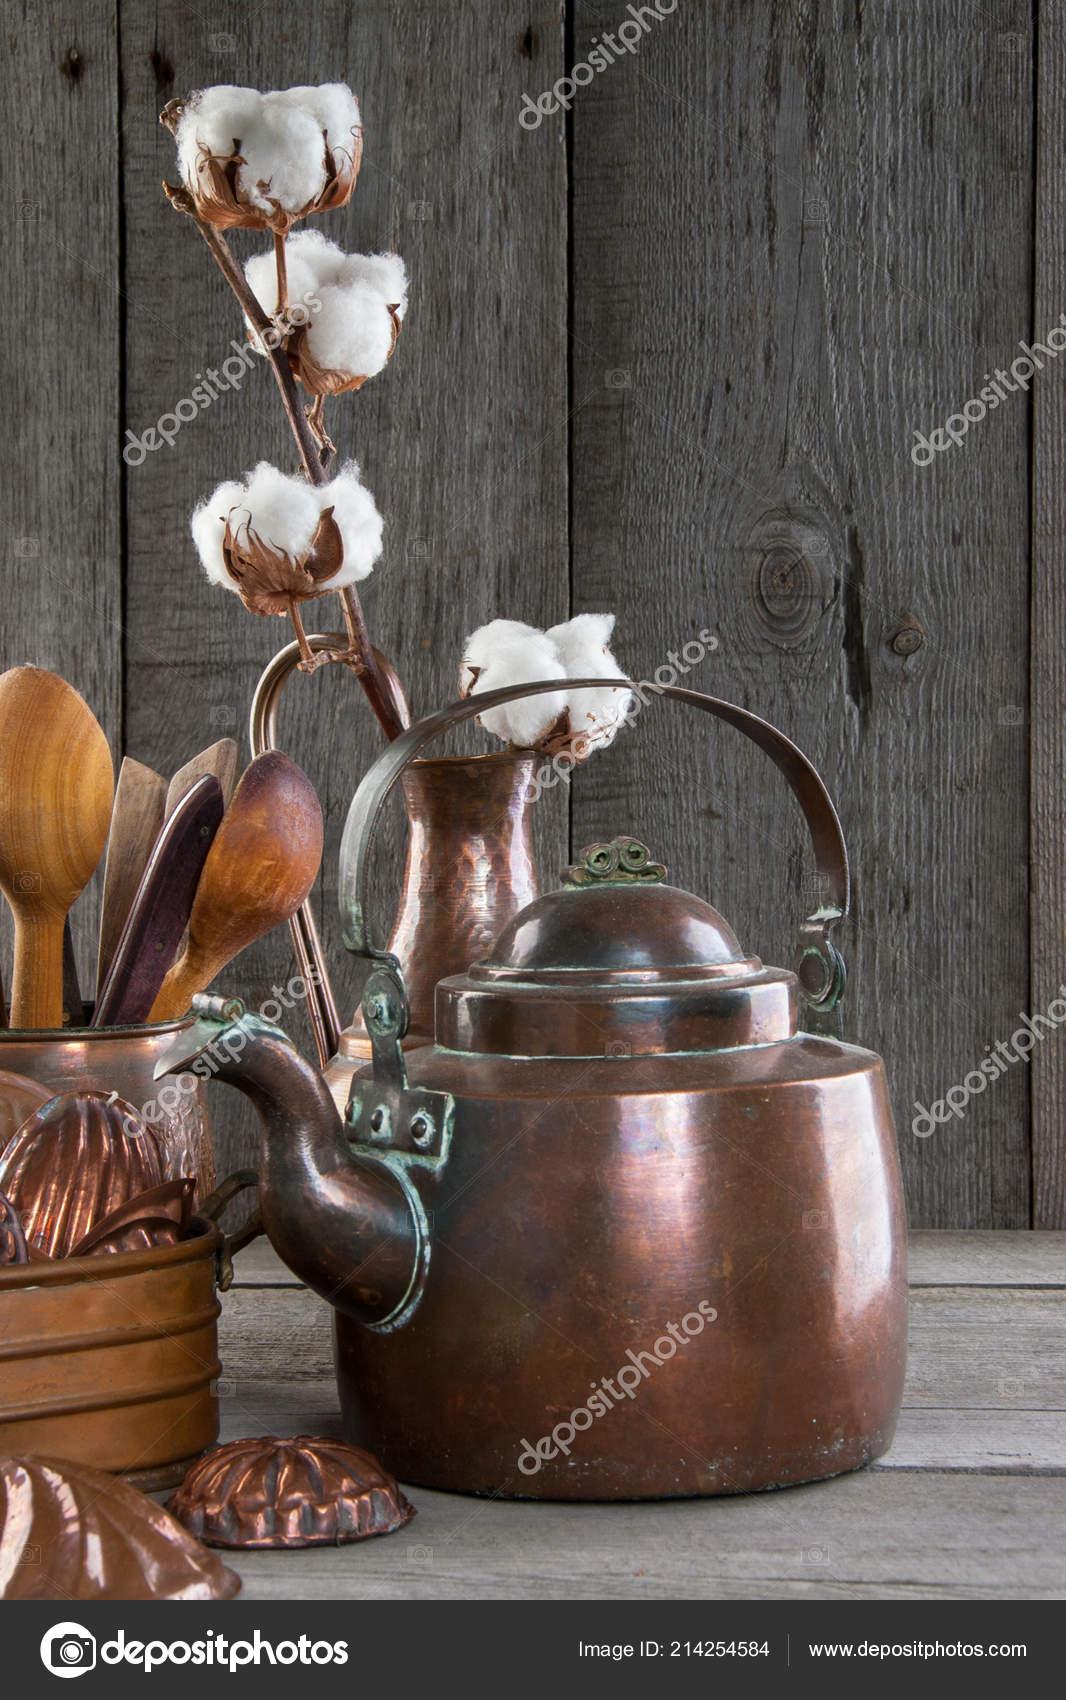 Vintage Copper Kettle Kitchen Utensils Wooden Gray